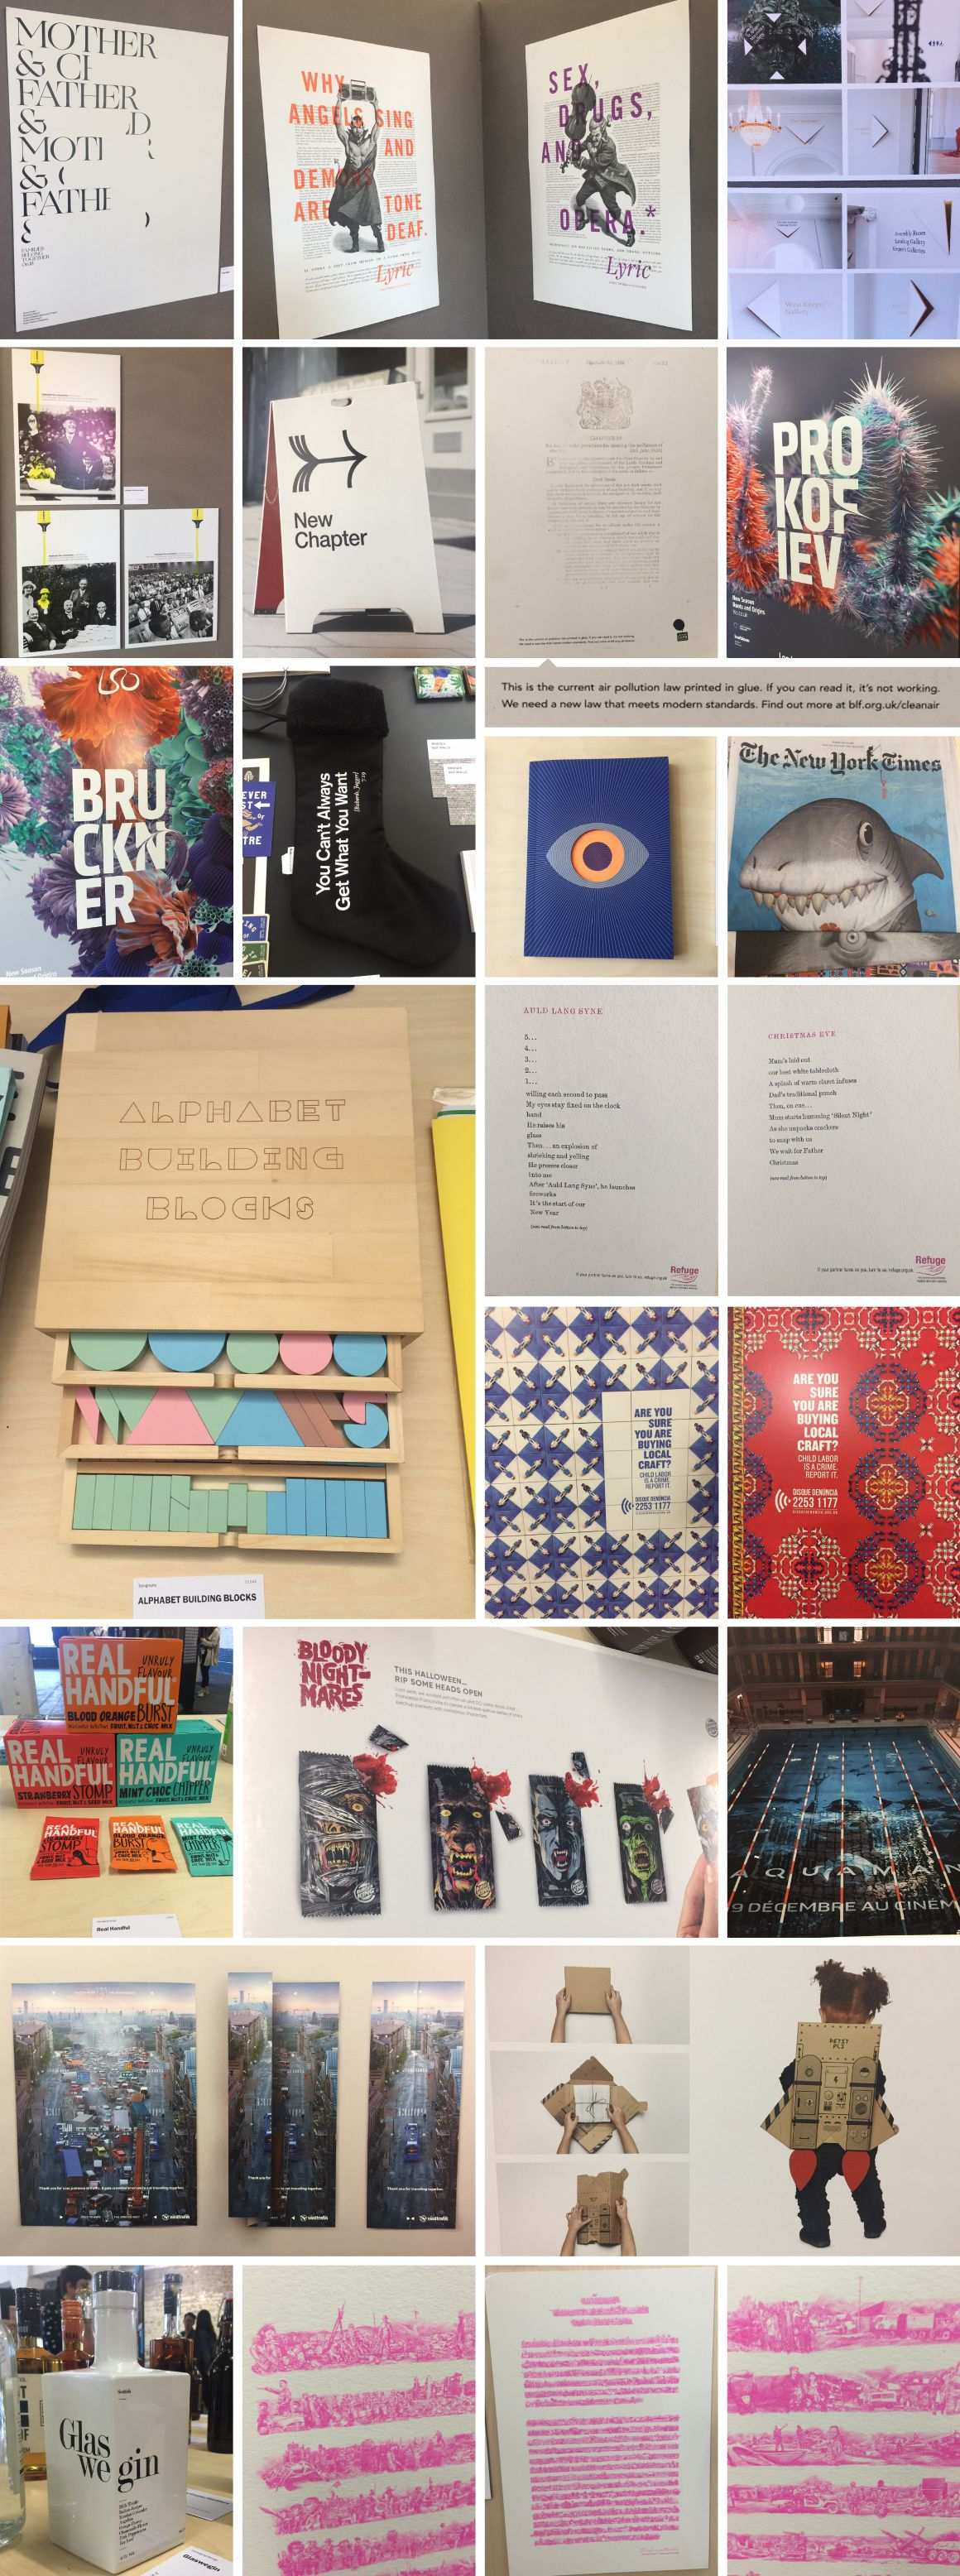 inspirational design collage